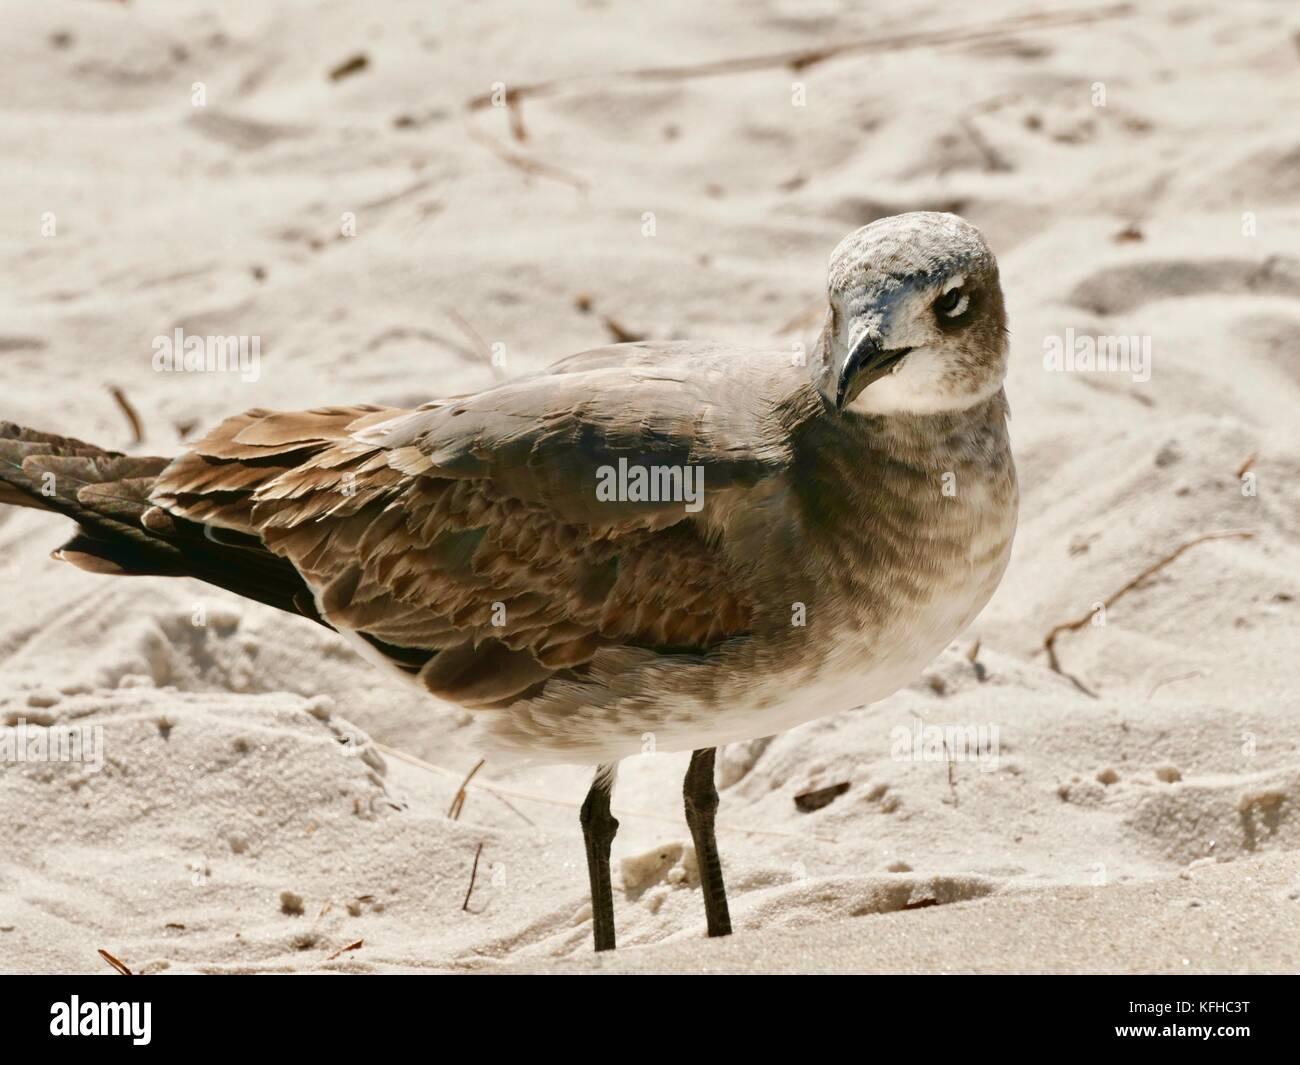 gull-at-beach-cedar-key-florida-usa-KFHC